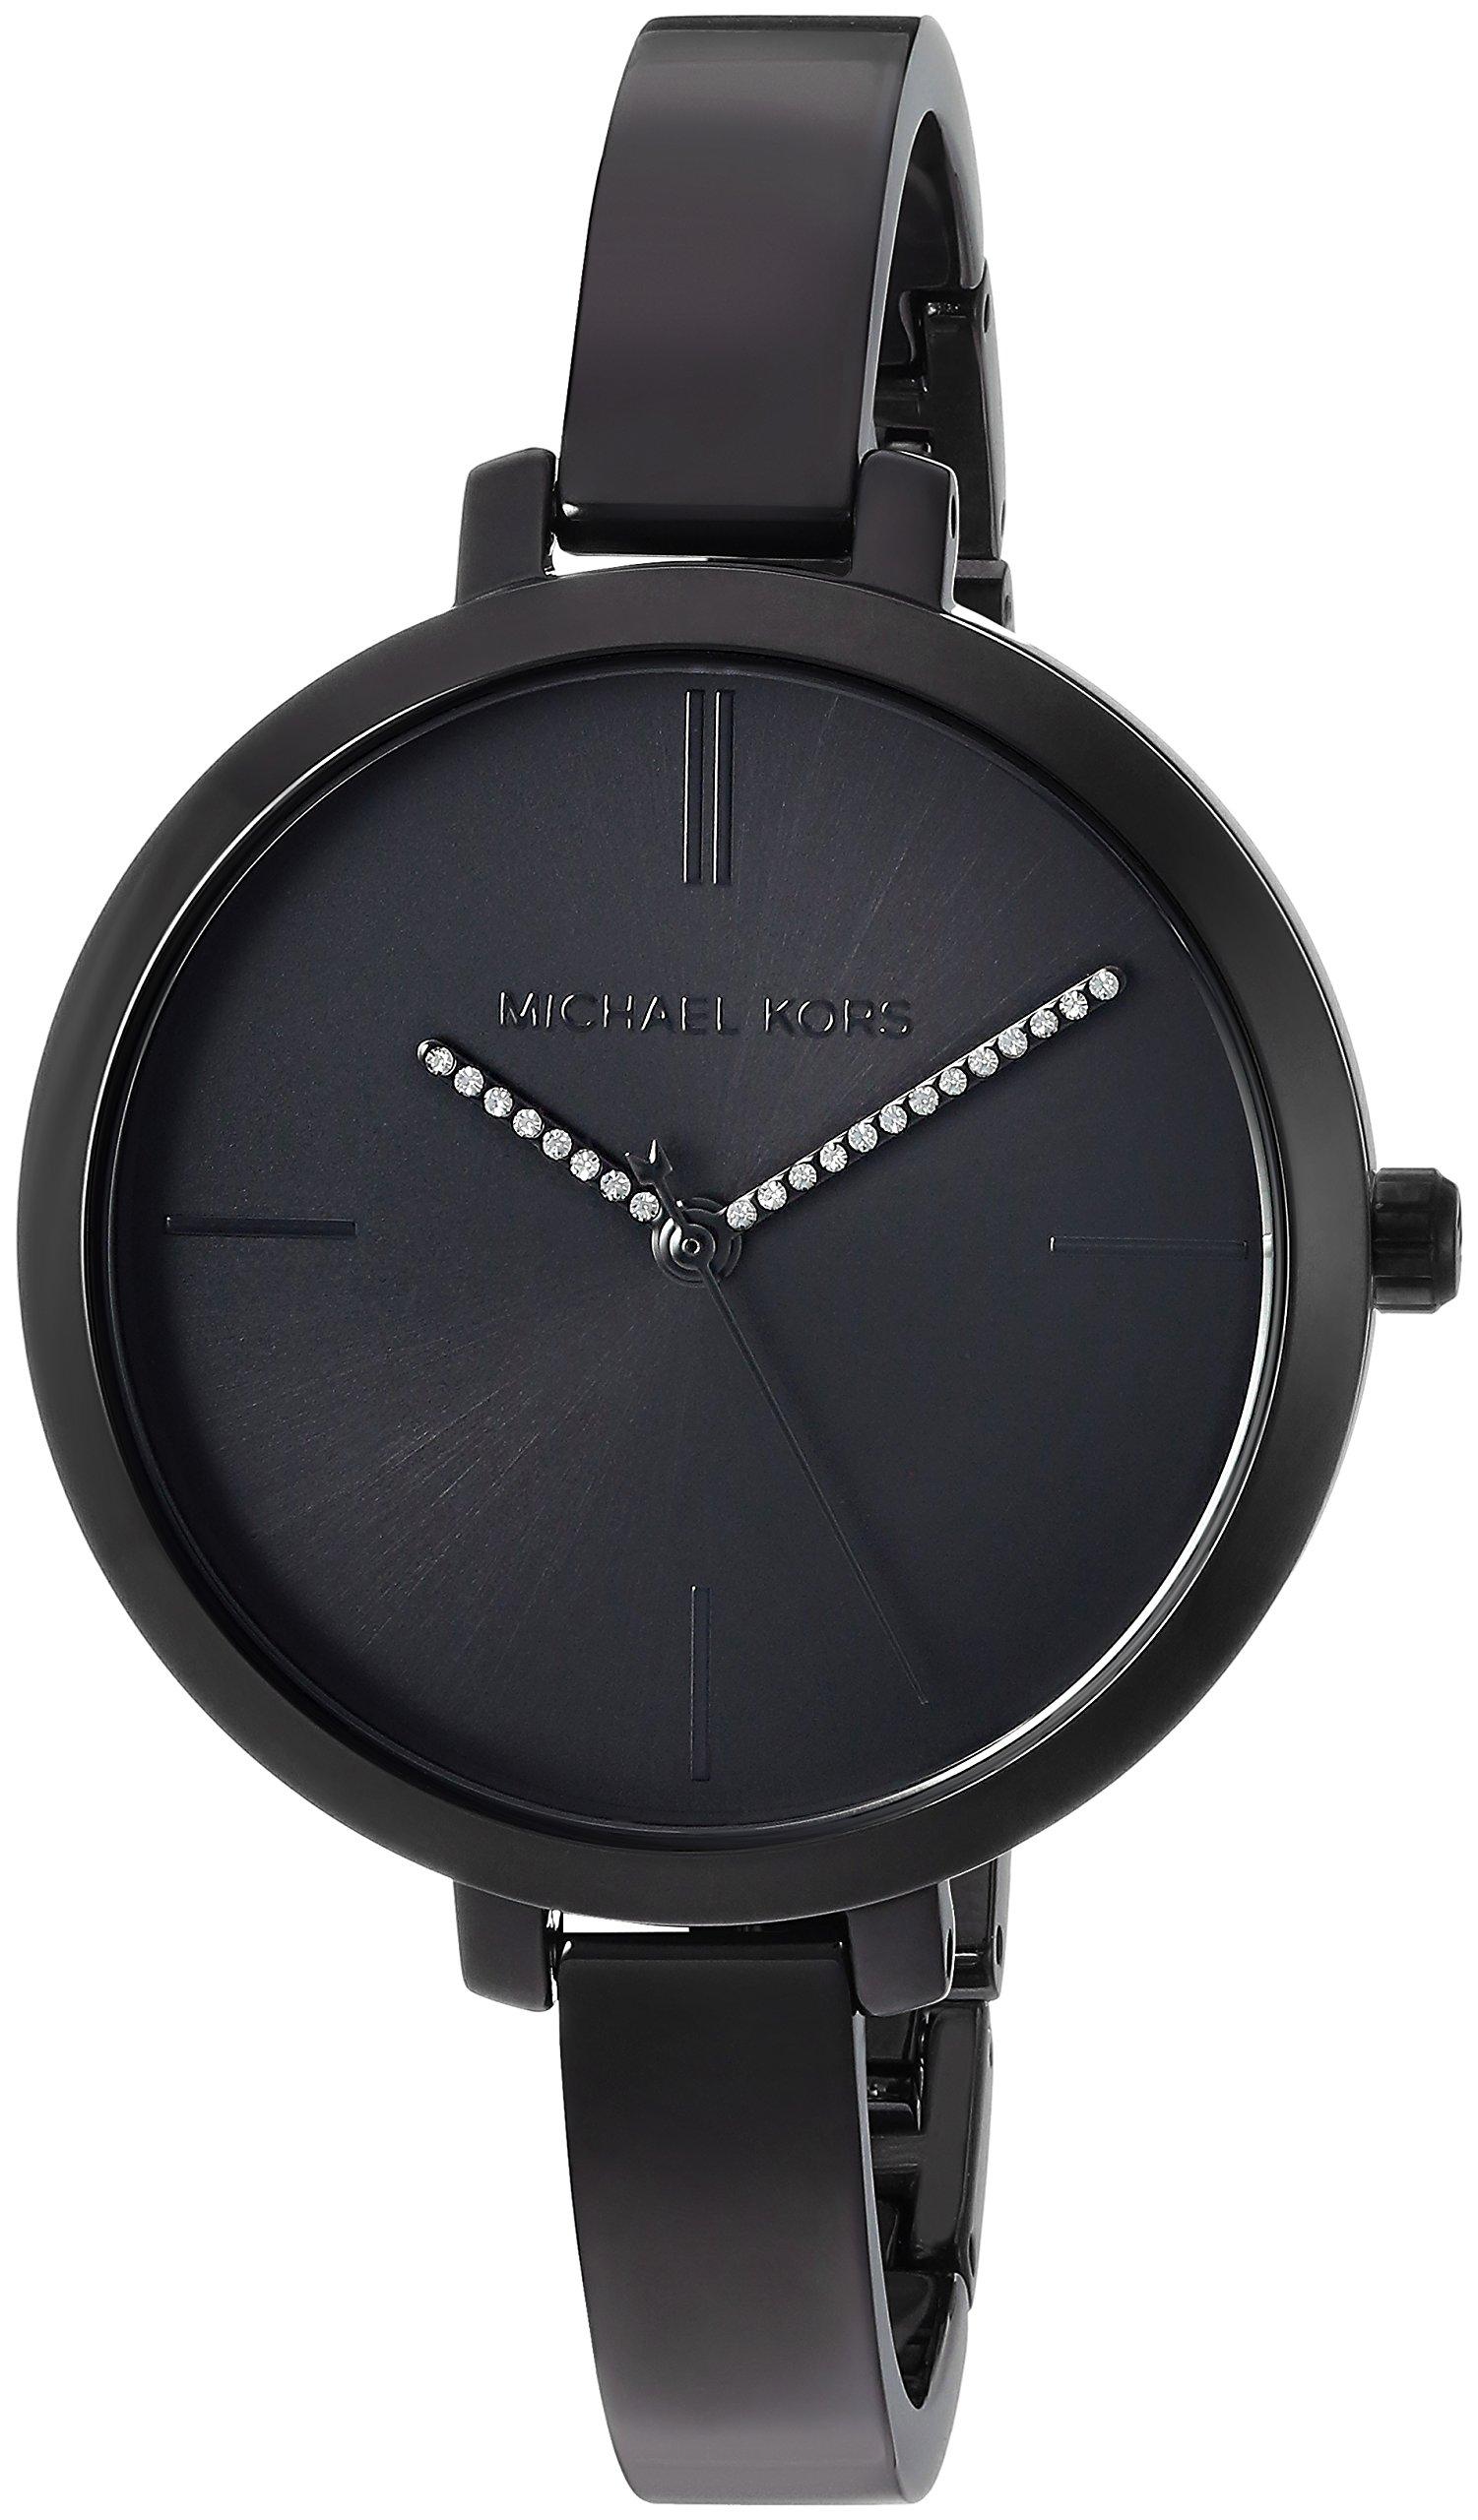 Michael Kors Women's 'Jaryn' Quartz Stainless Steel Casual Watch, Color:Black (Model: MK3786)